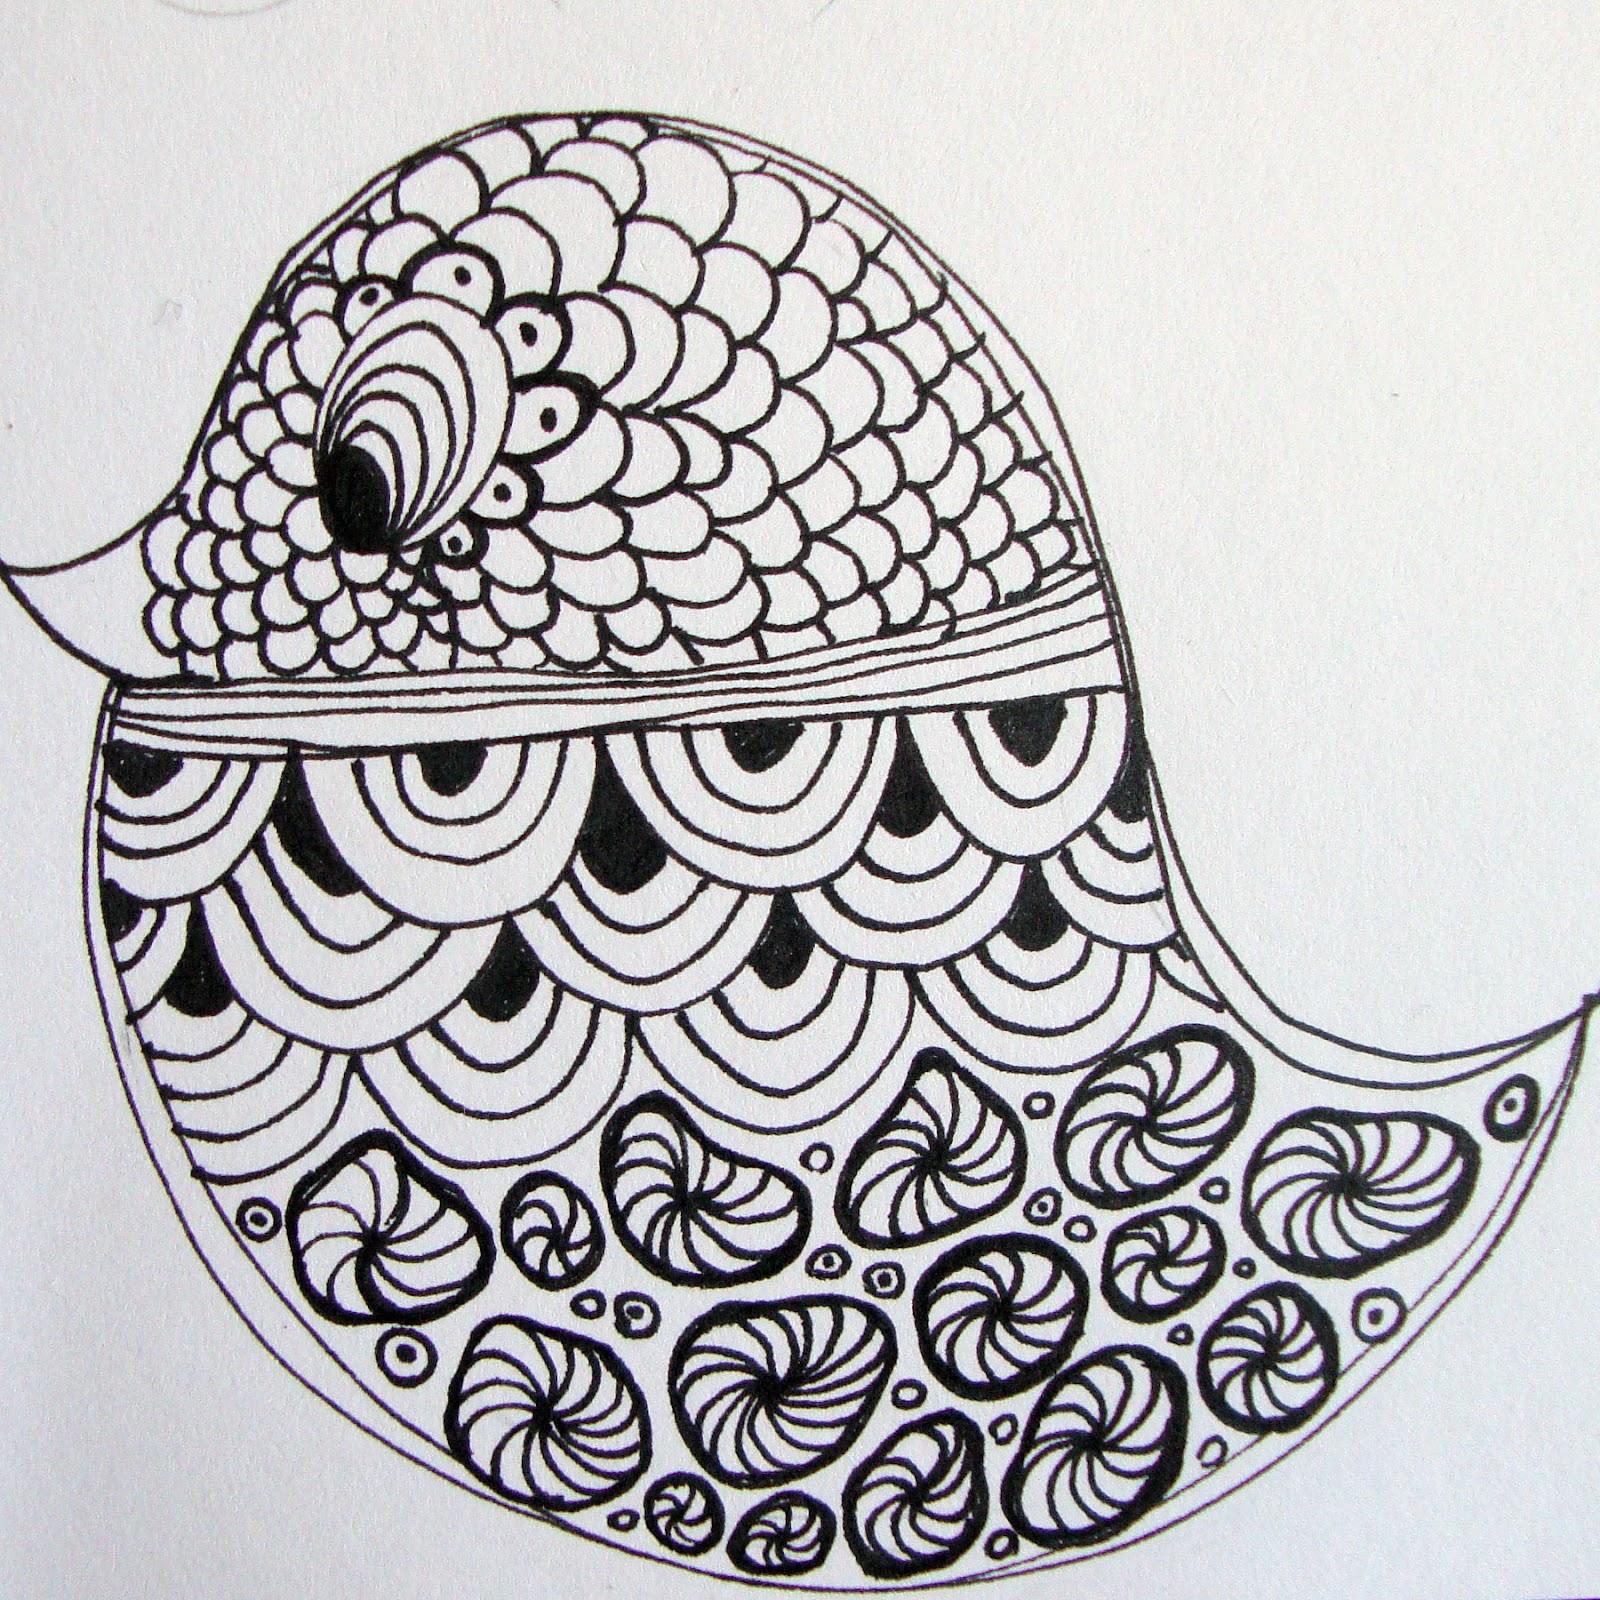 Doodle-Tangle-1.jpg